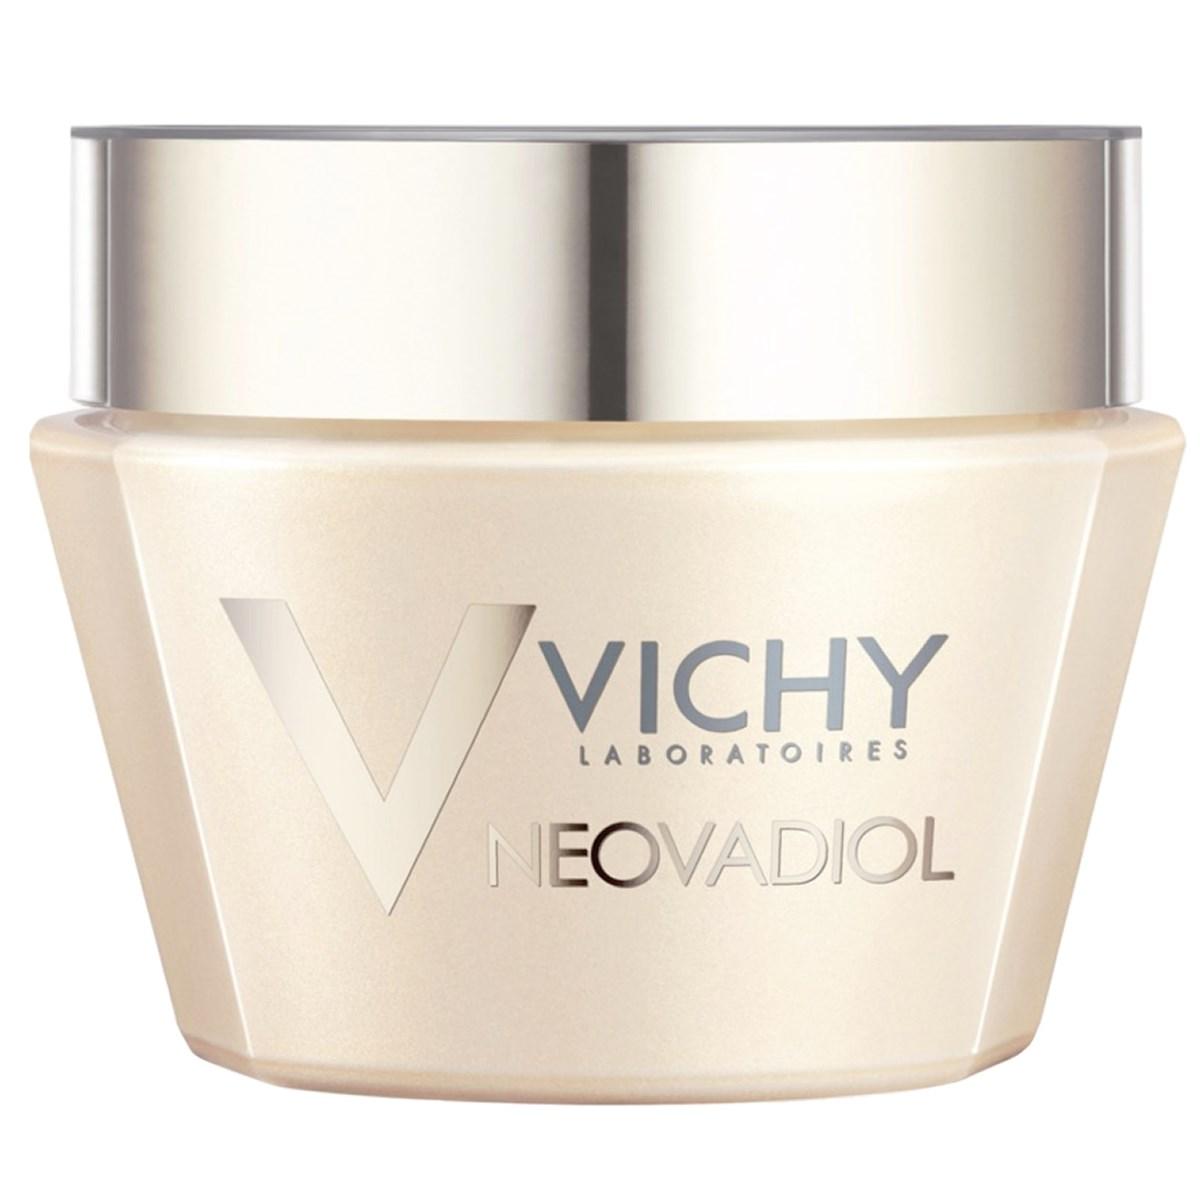 Vichy Neovadiol Compensating Complex Advanced Replenishing Care Normal/Combination Skin